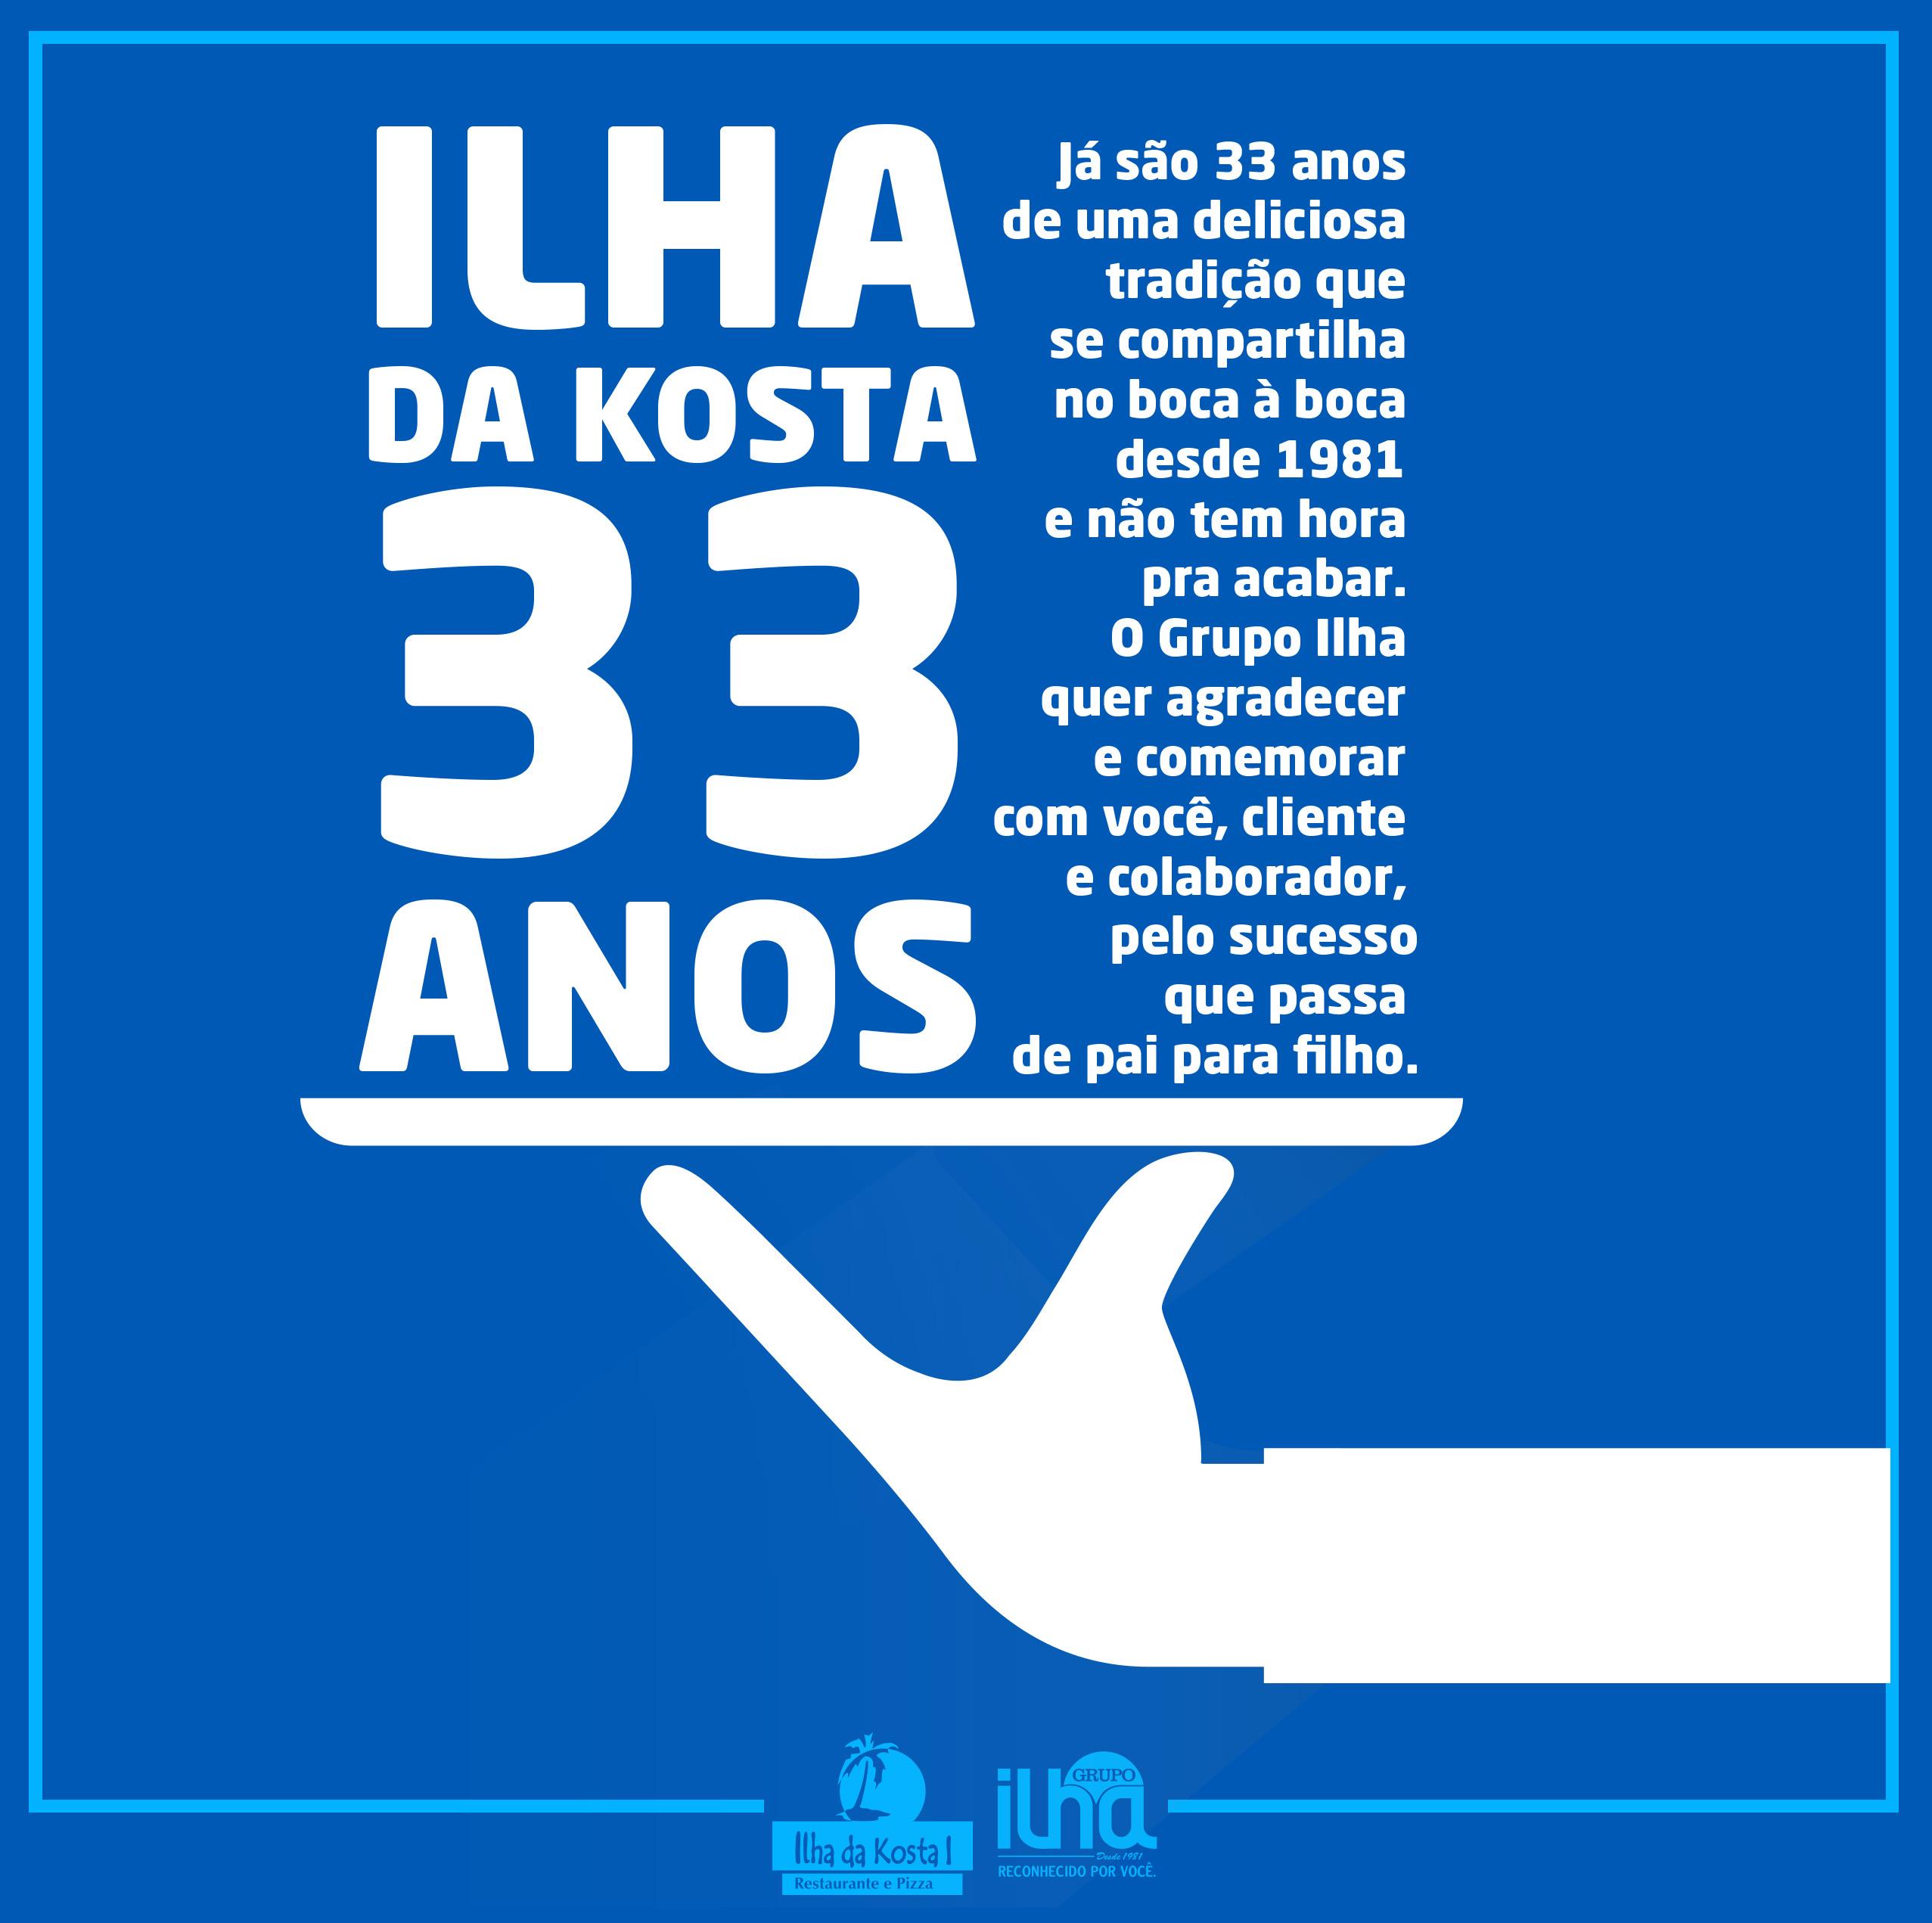 GH-009-14_PostFacebook_33anos_IlhadaKosta_01.092.jpg